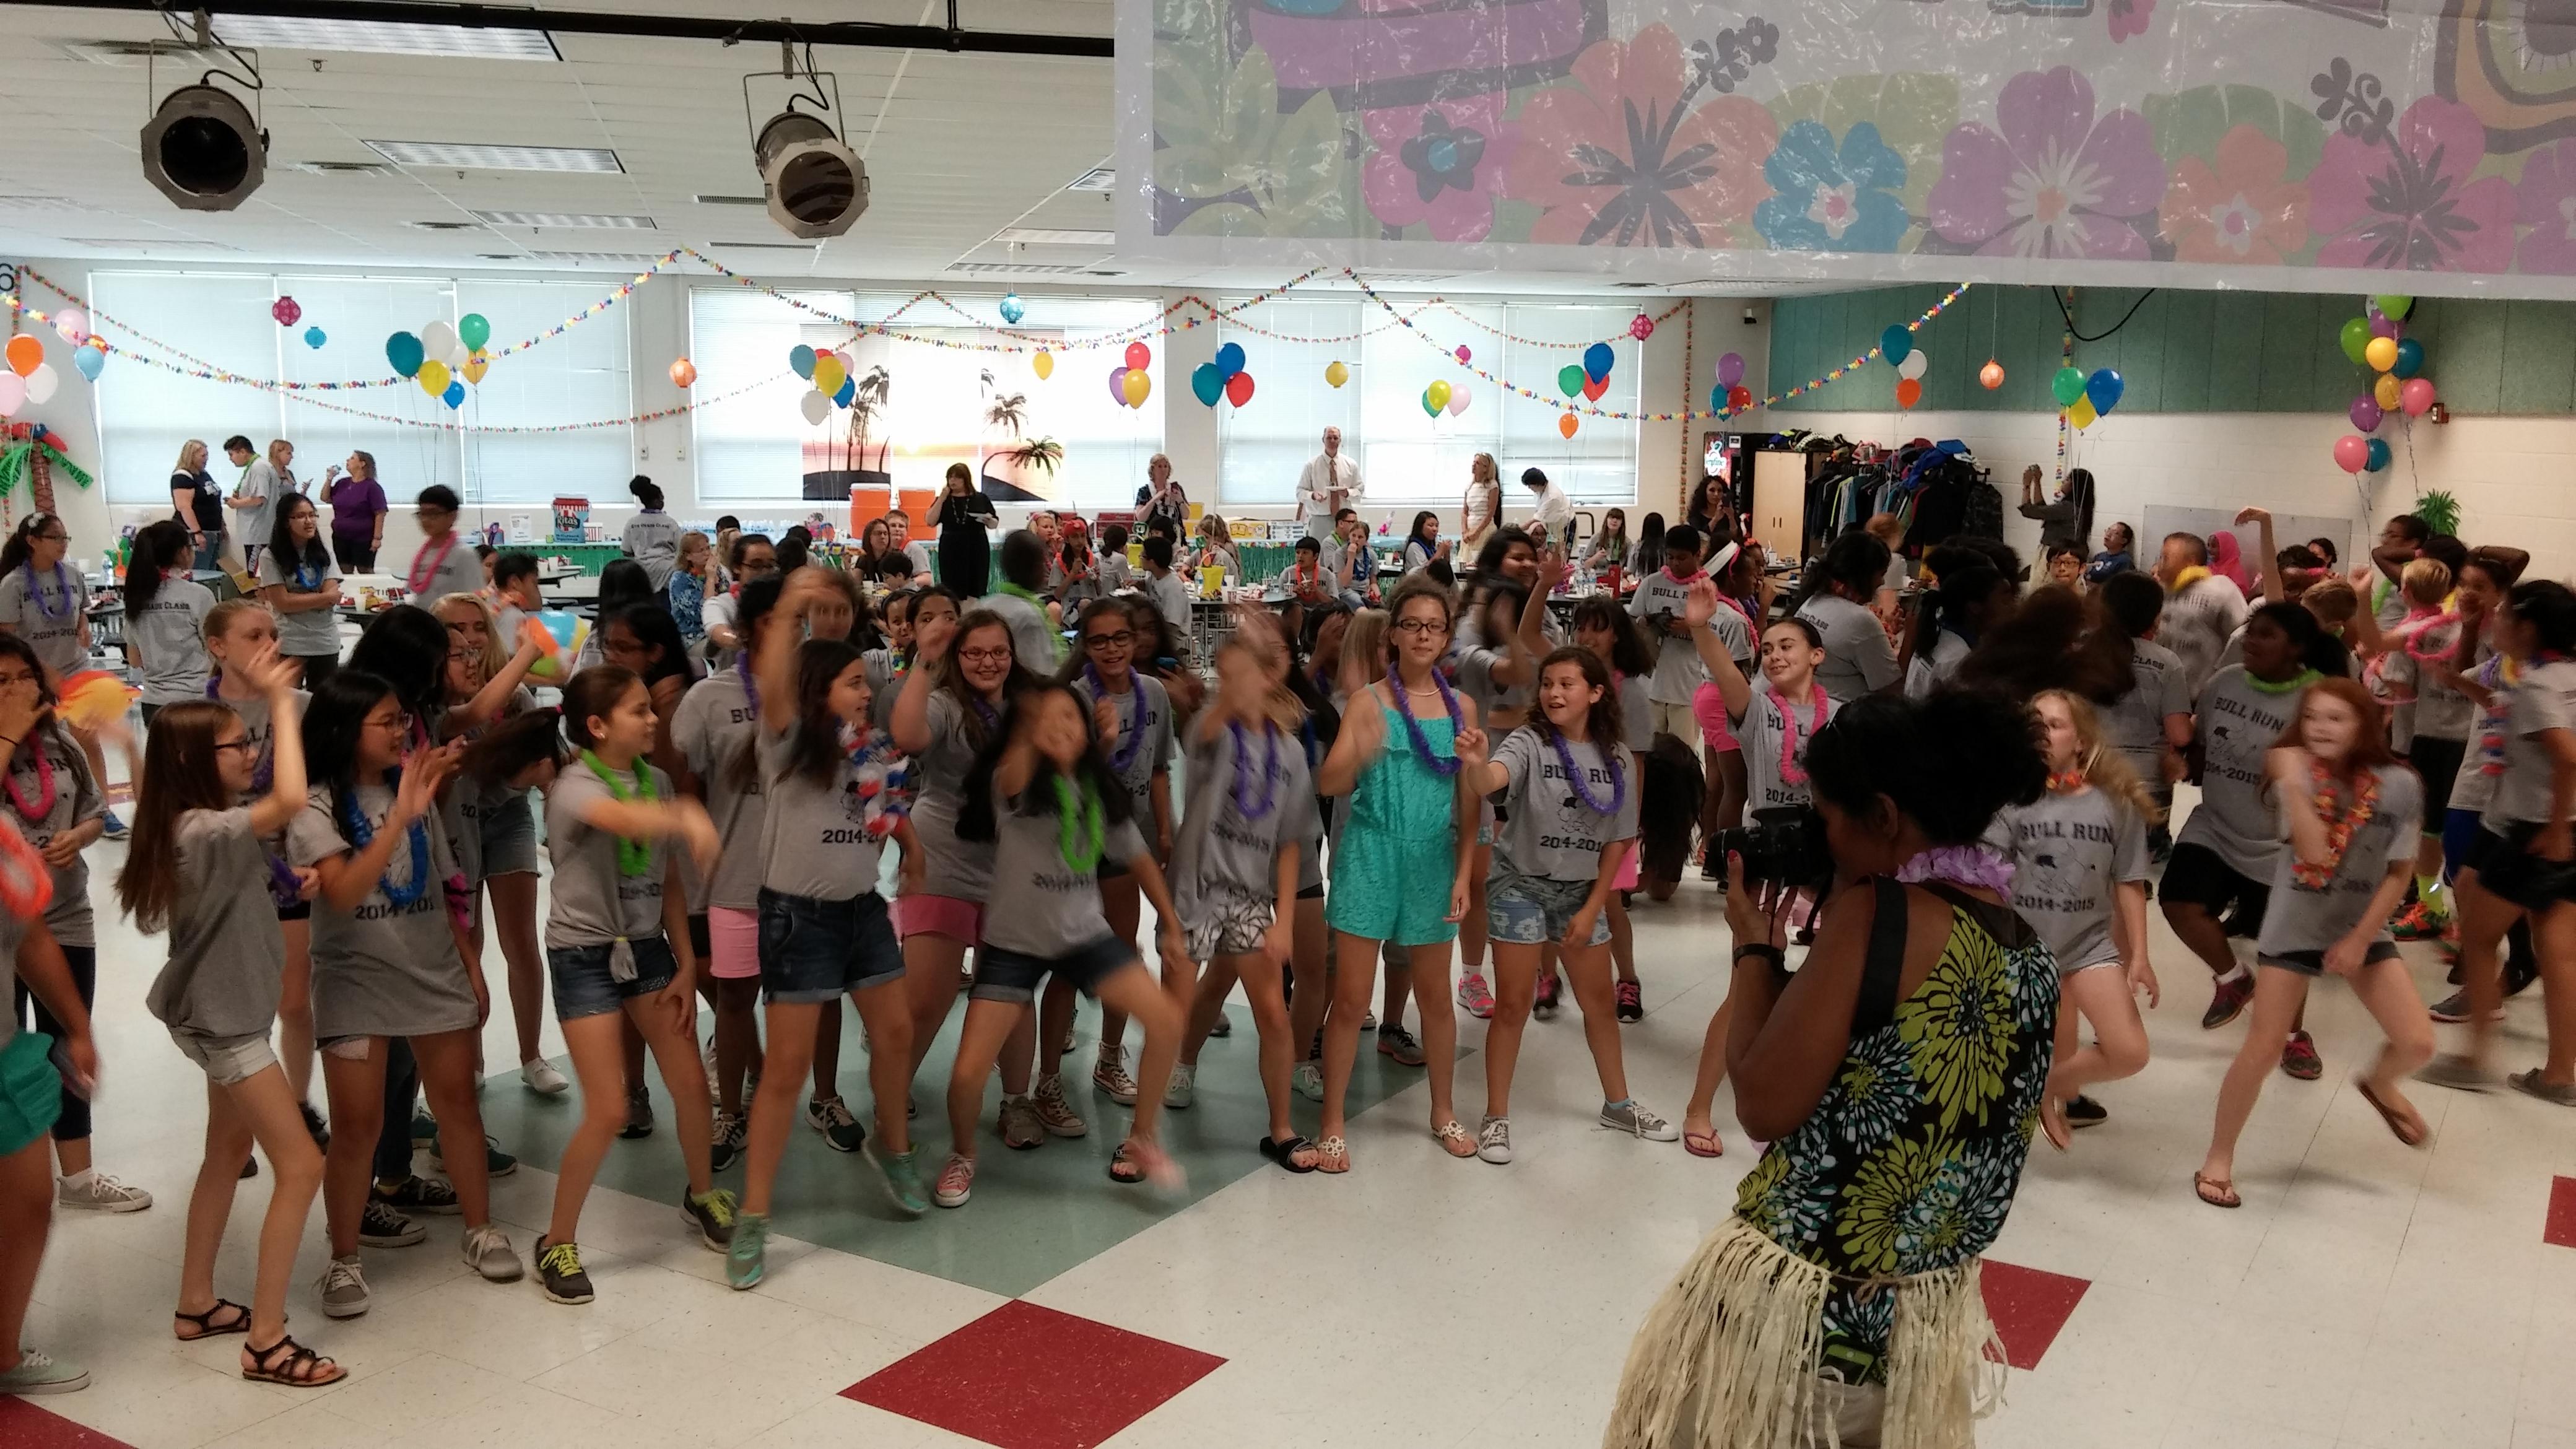 bobby-g's-disc-jockeys-school-dances-2